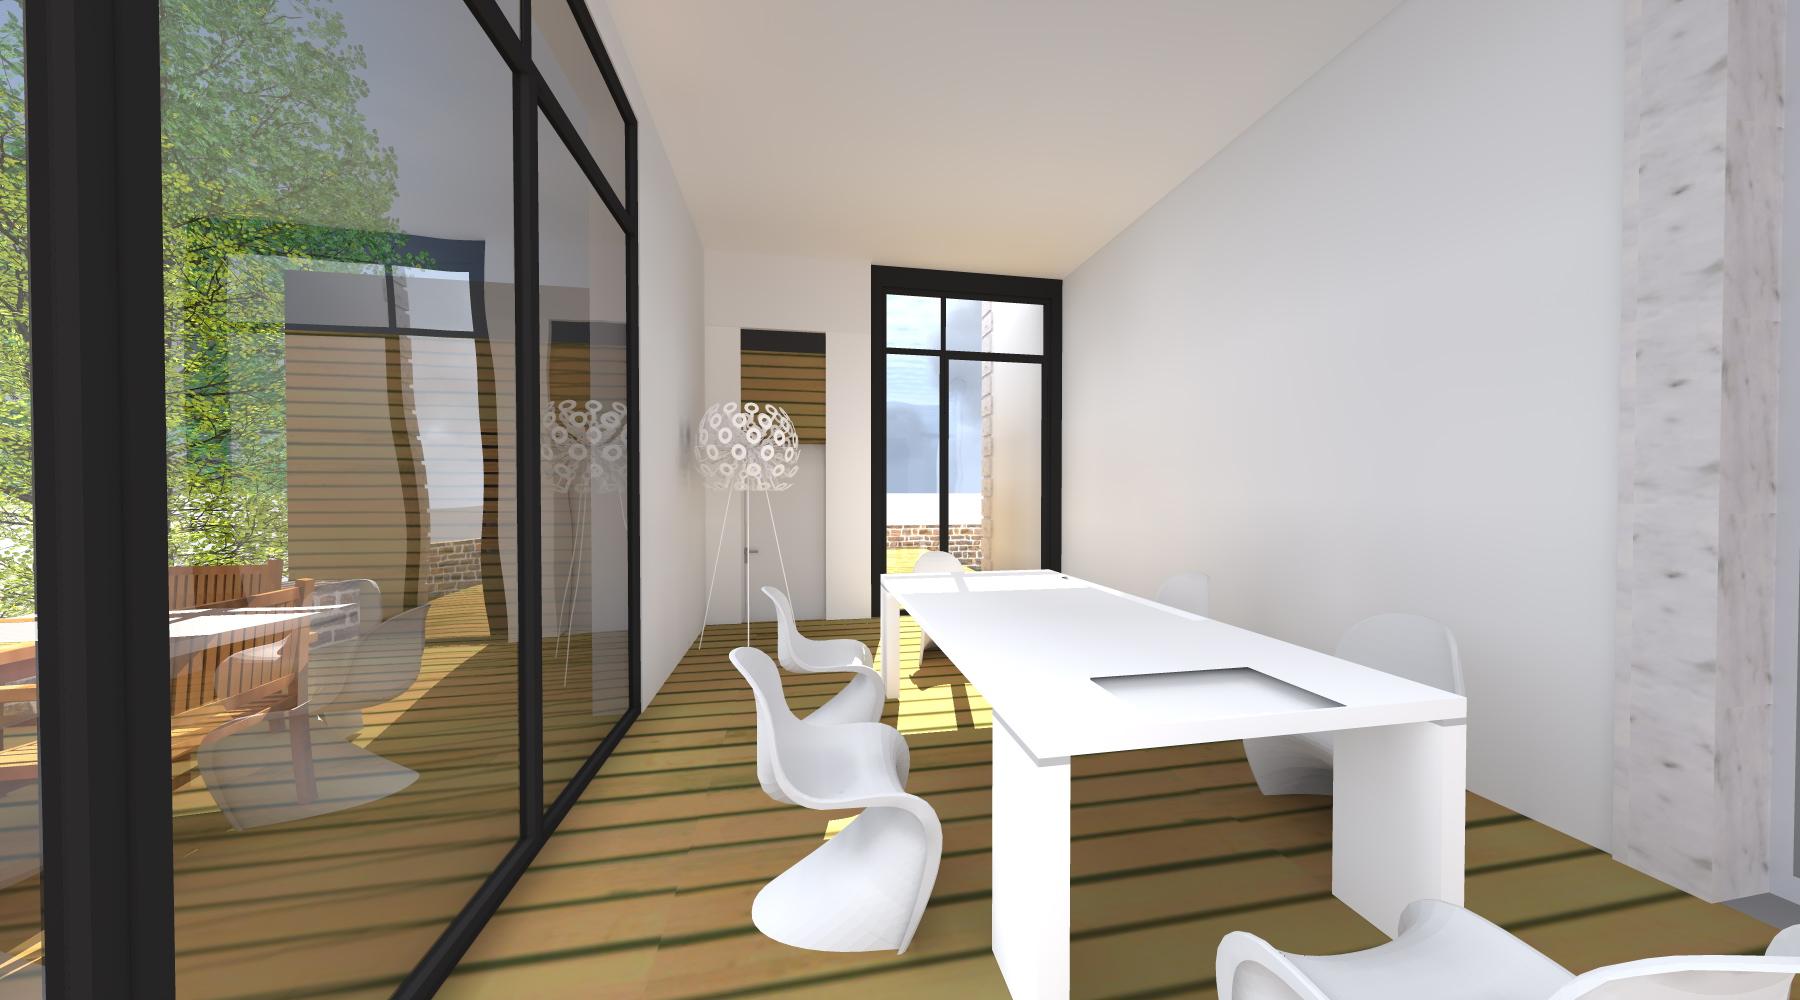 Projet lh v 1 2 vue architecte lise roturier for Extension maison tva